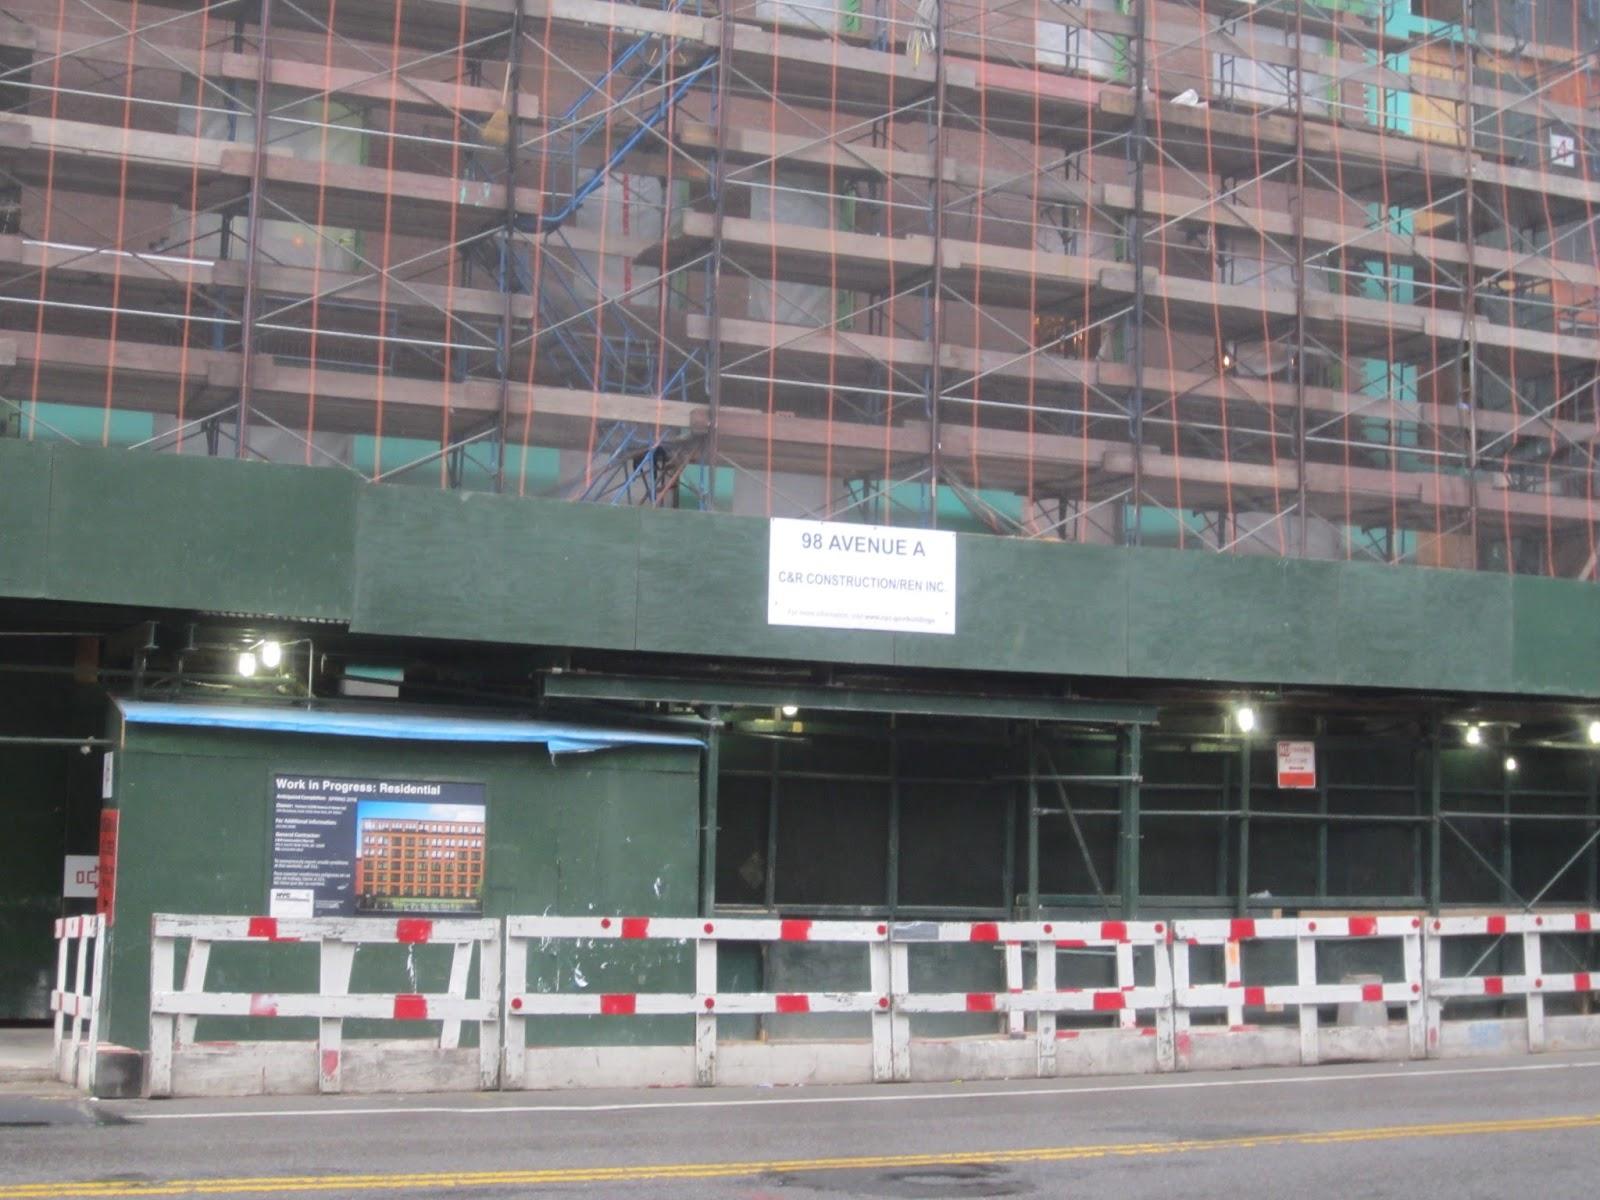 EV Grieve: Sidewalk bridge at 100 Avenue A looks so naked